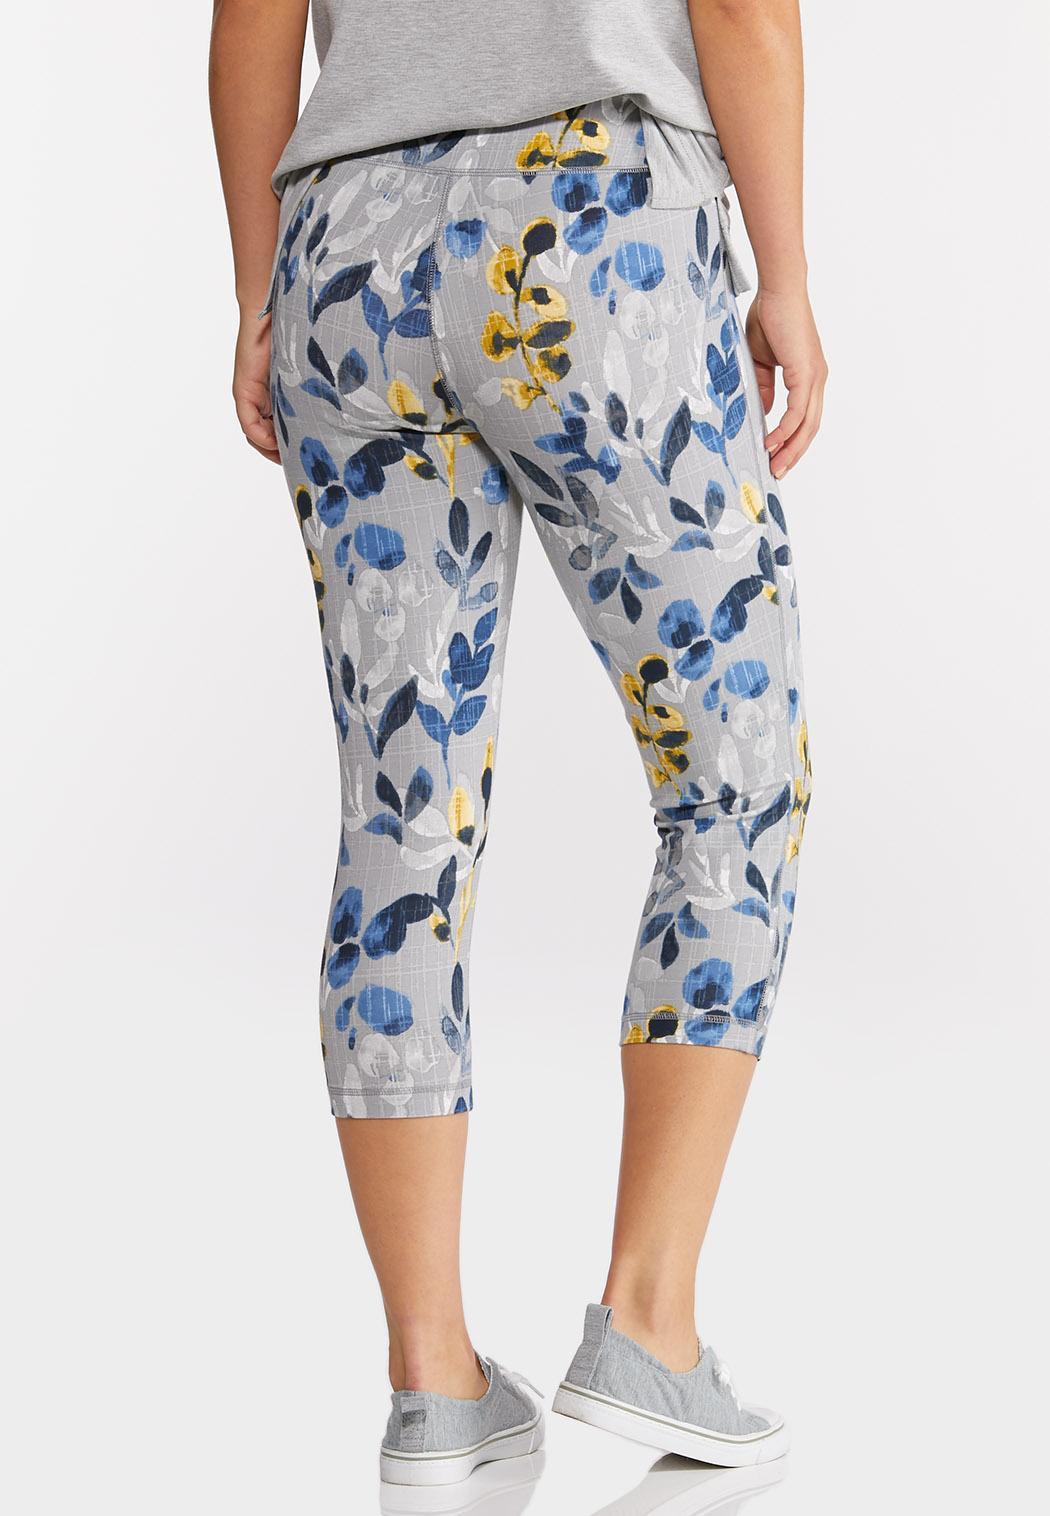 Cropped Blue Floral Leggings (Item #44276109)